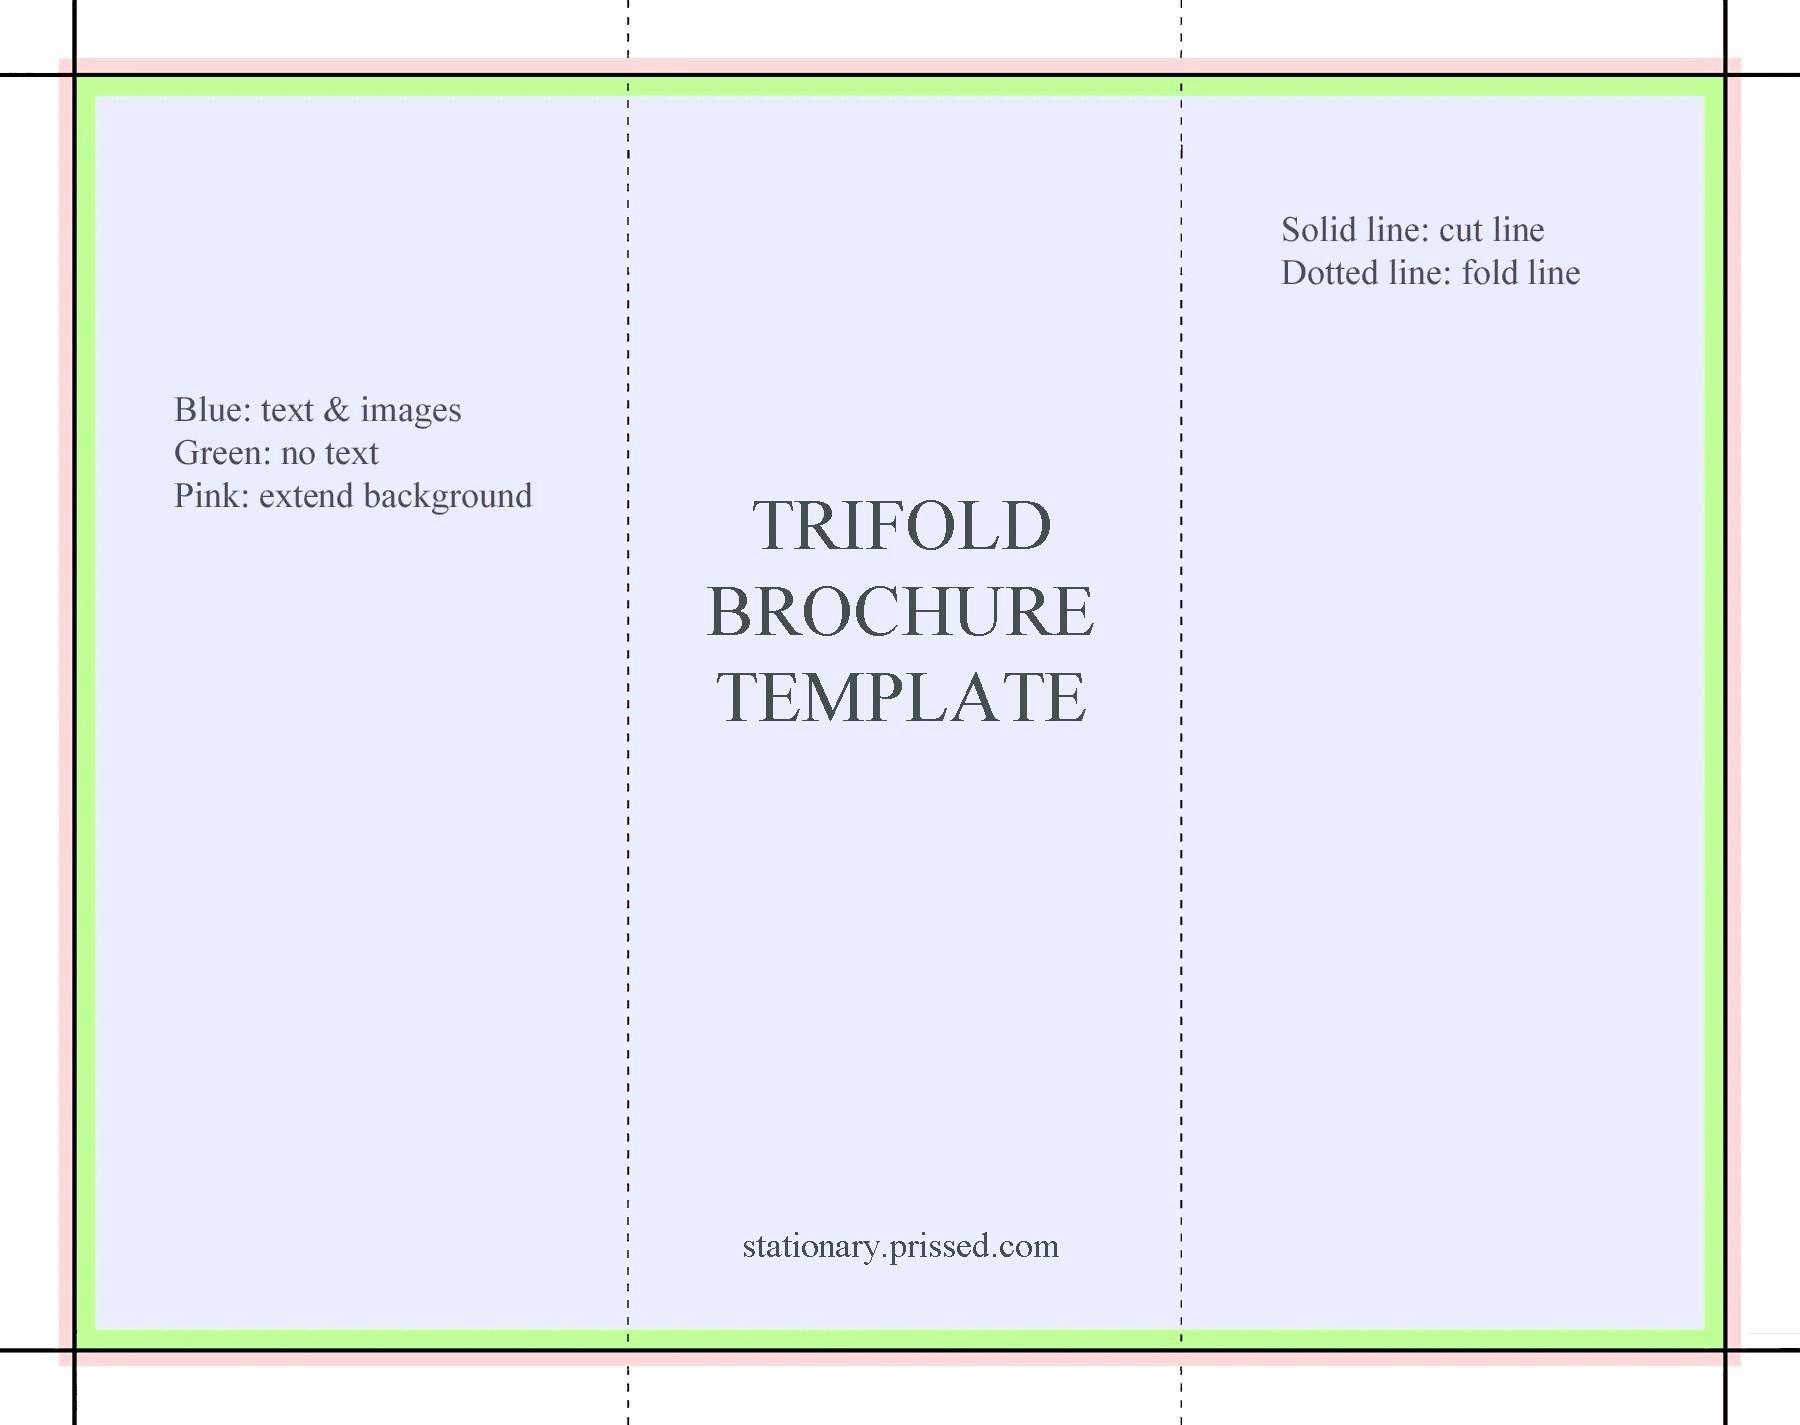 004 Template Ideas Google Docs Outstanding Brochure Tri Fold Throughout Google Docs Tri Fold Brochure Template